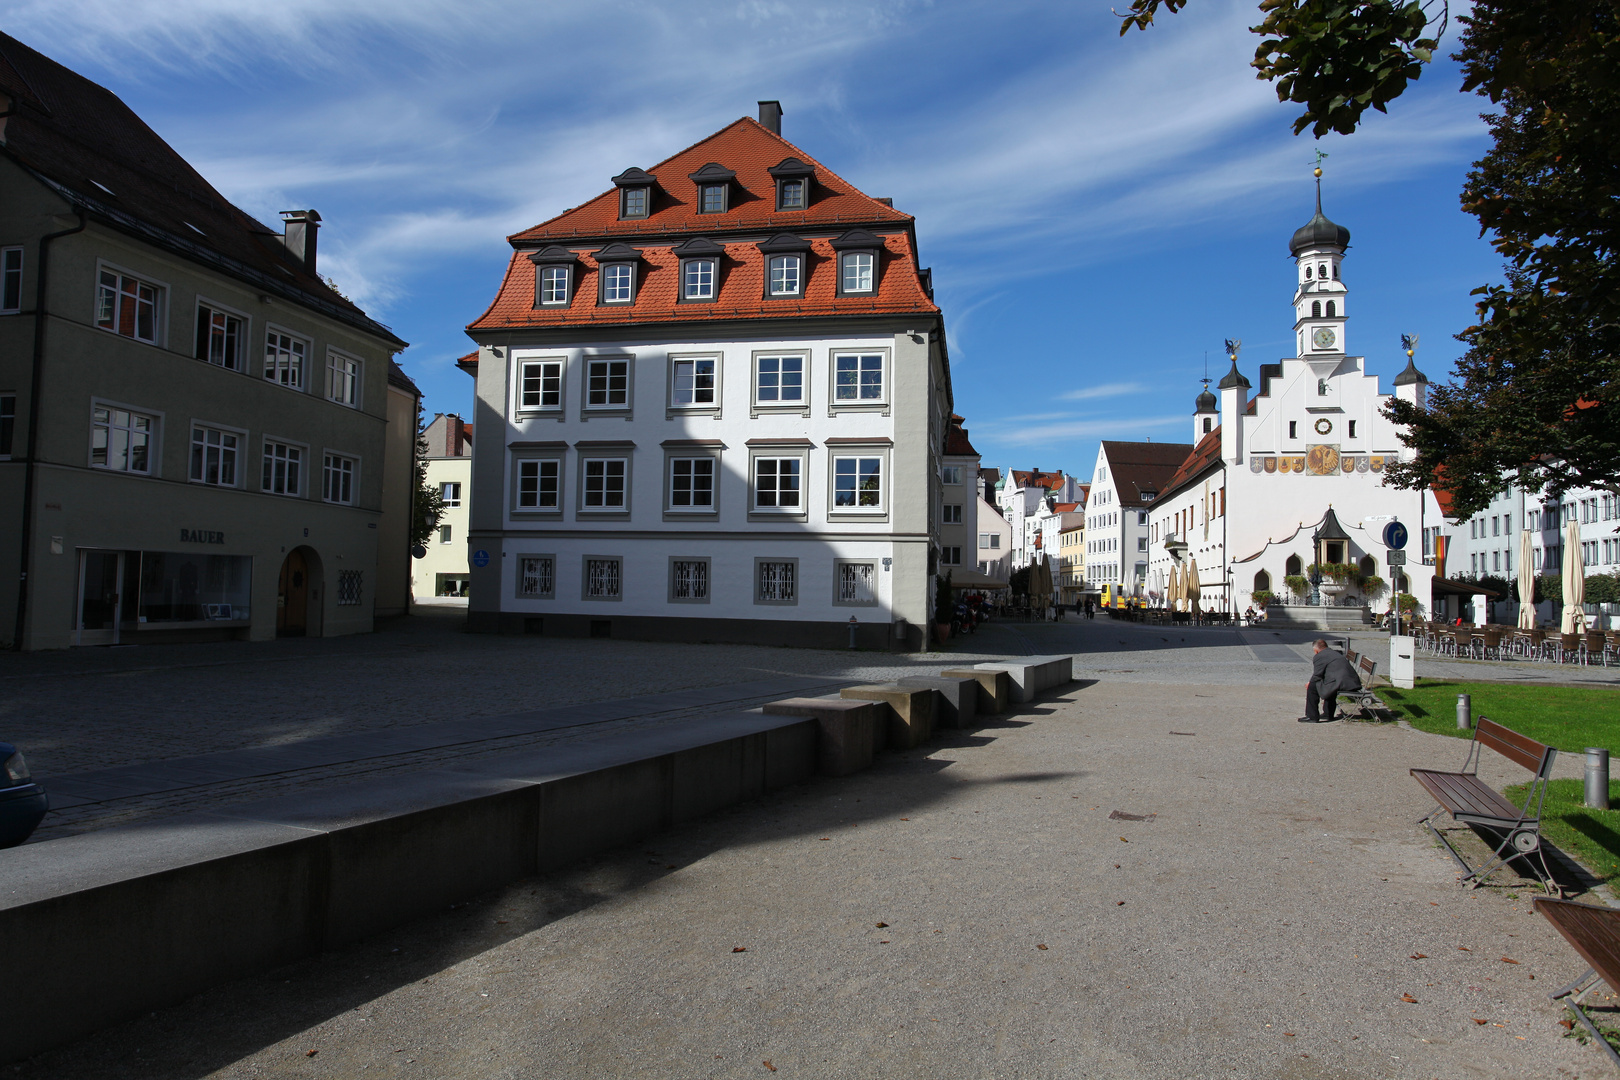 Rathausplatz in Kempten